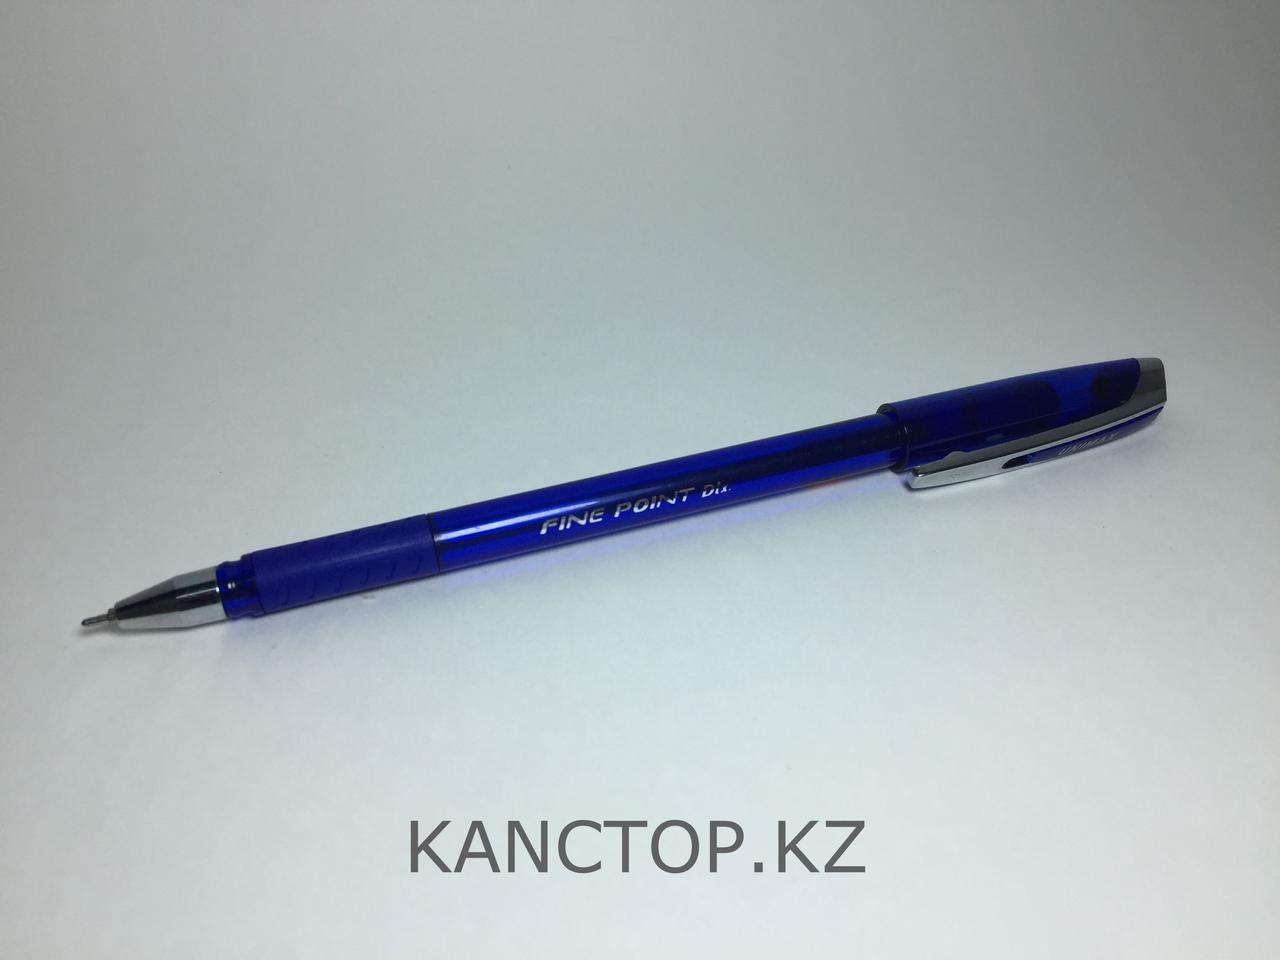 Ручка шариковая UNI-MAX FINEPOINT DLX Синяя